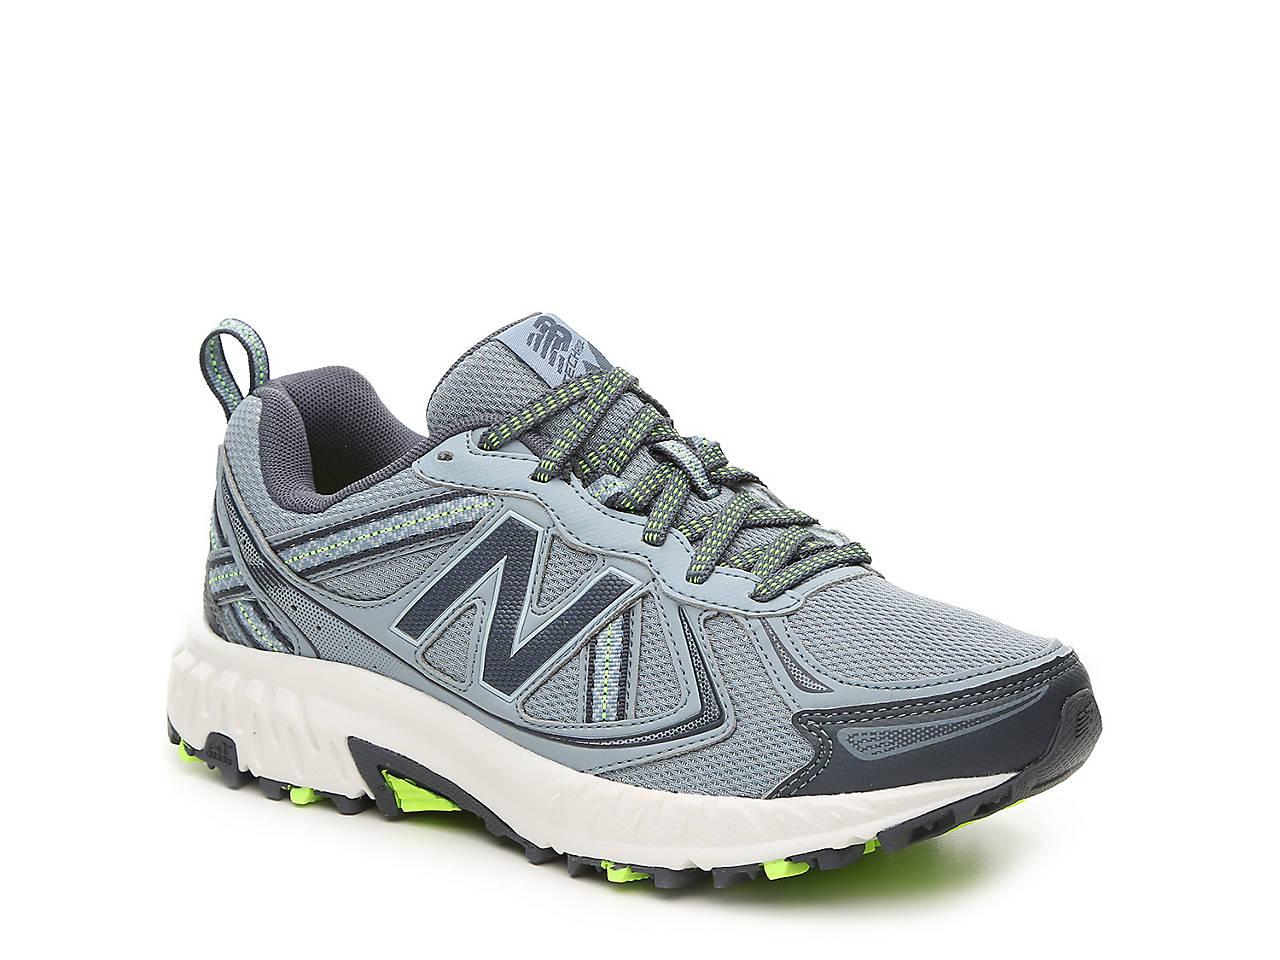 15dc918f27b New Balance 410 v5 Trail Running Shoe - Women s Women s Shoes